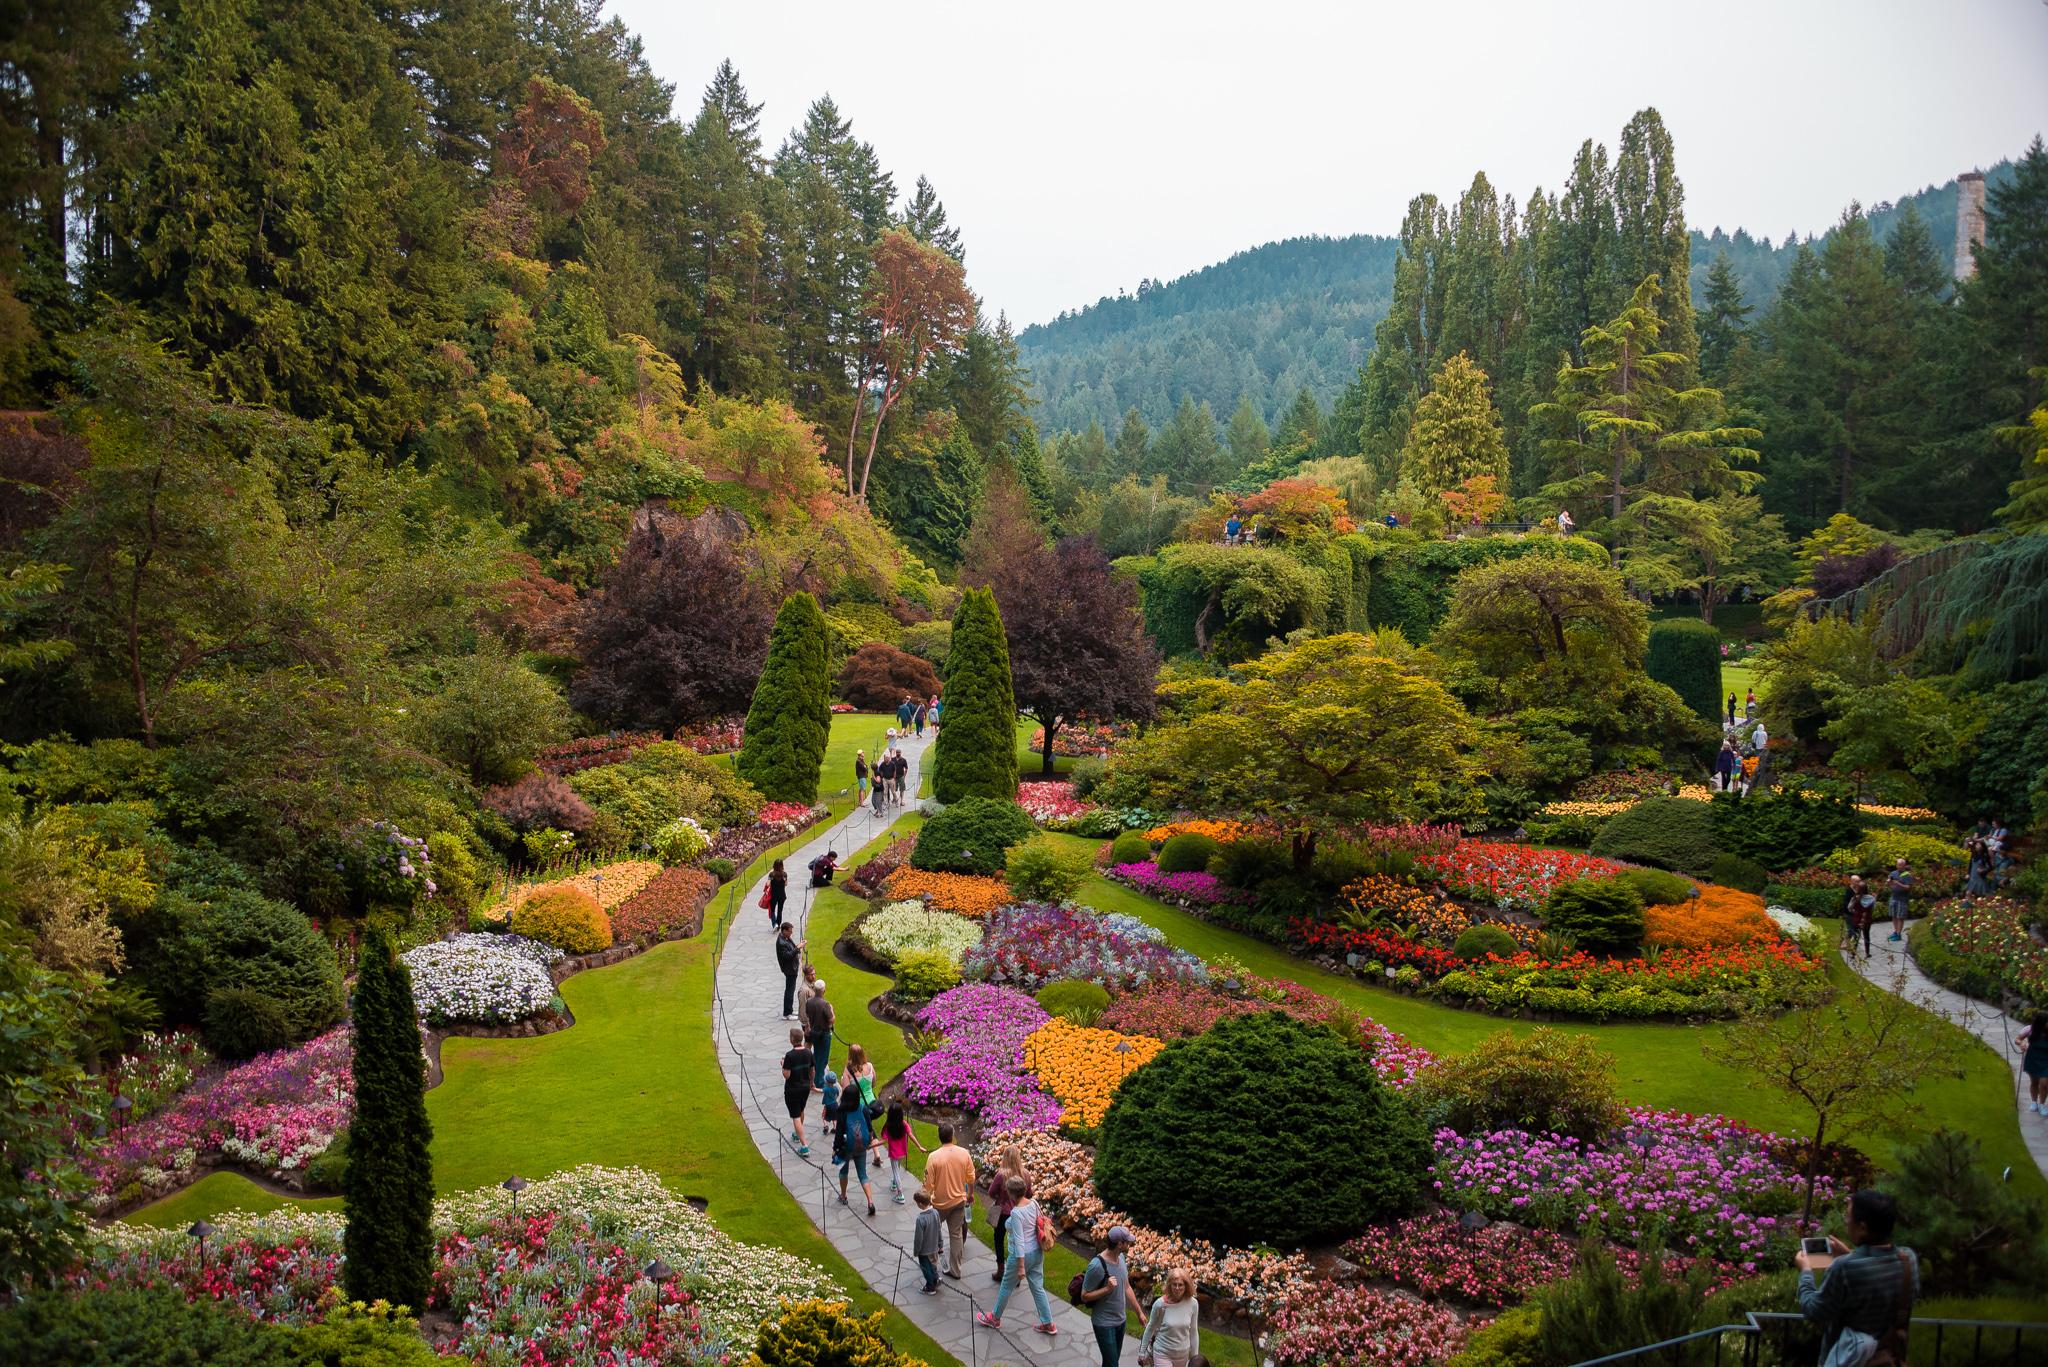 2017-08-05 - Butchart Gardens - 019